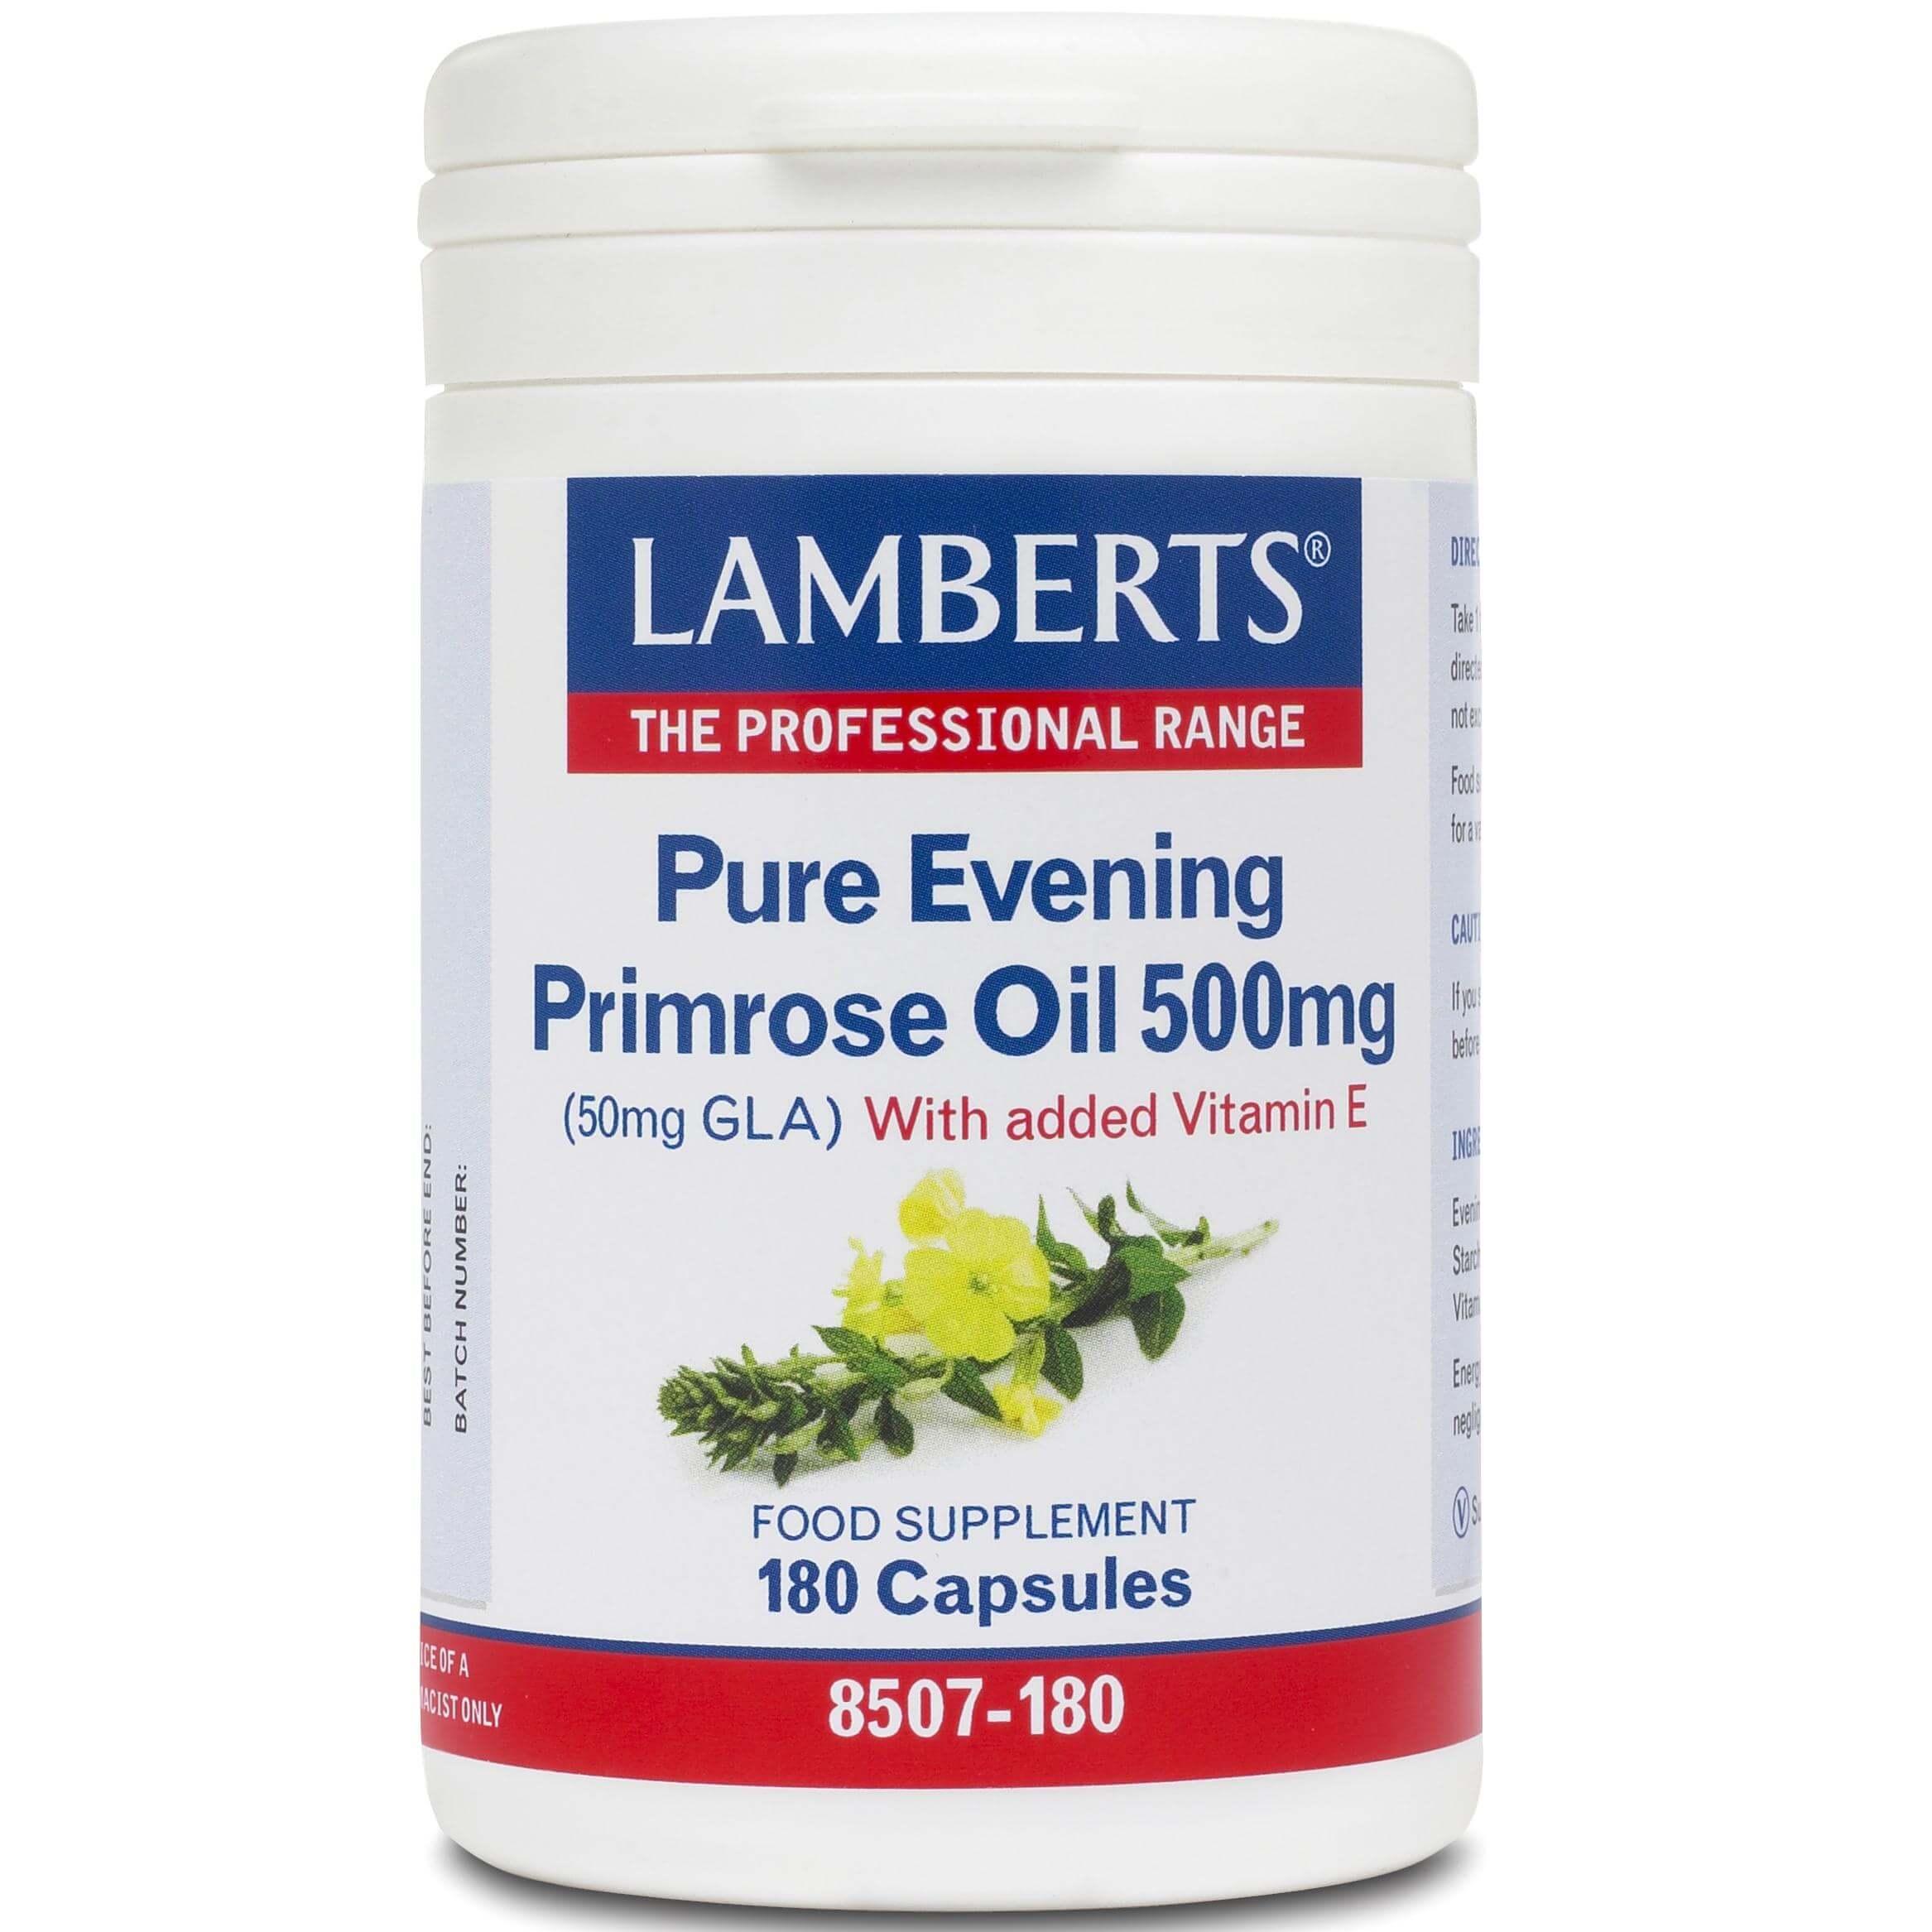 Lamberts Evening Primrose Oil Συπλήρωμα Διατροφής Έλαιου Νυχτολούλουδου γιαΣωστή Λειτουργεία του Οργανισμού500mg 180tabs